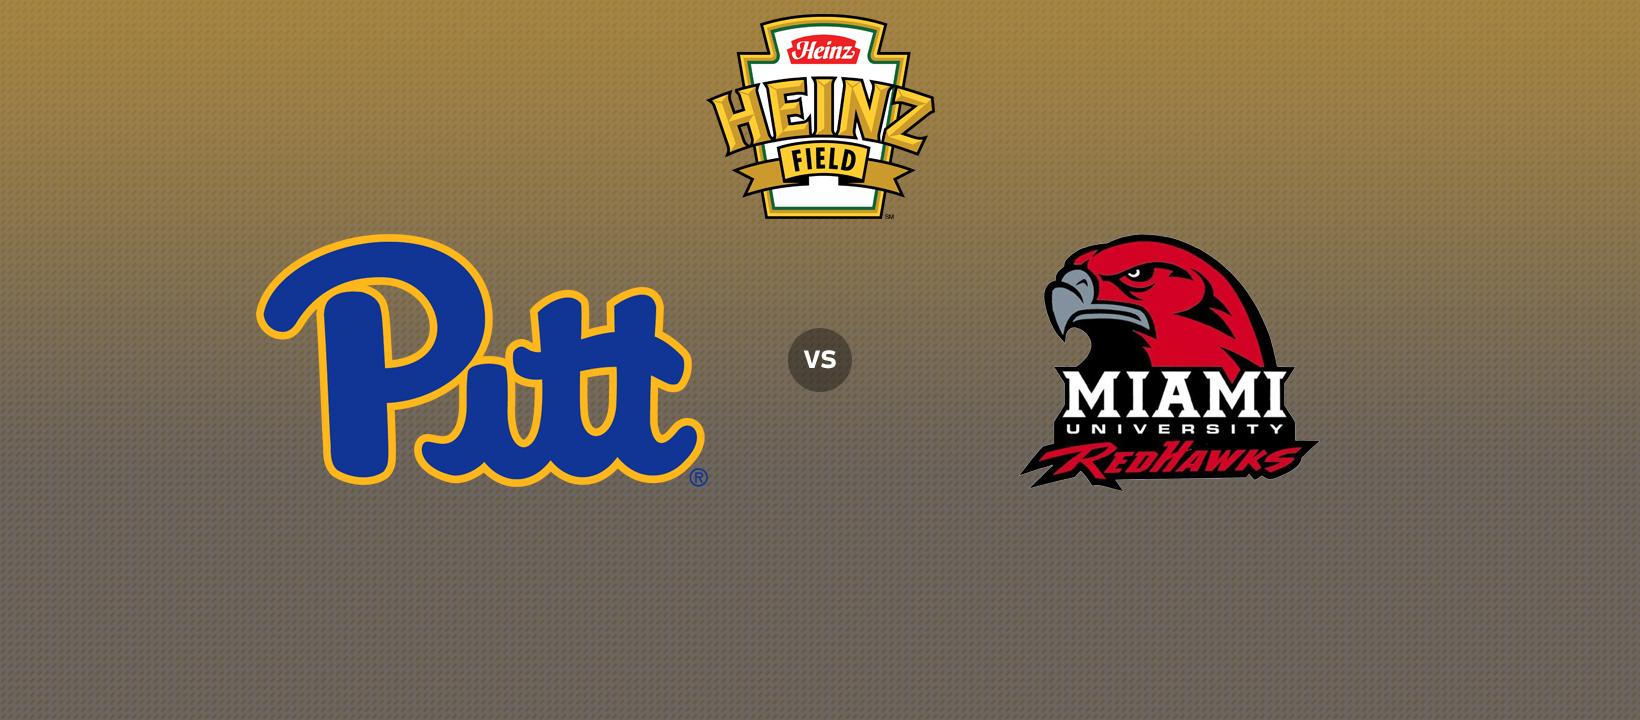 2020 Pitt vs. Miami Ohio